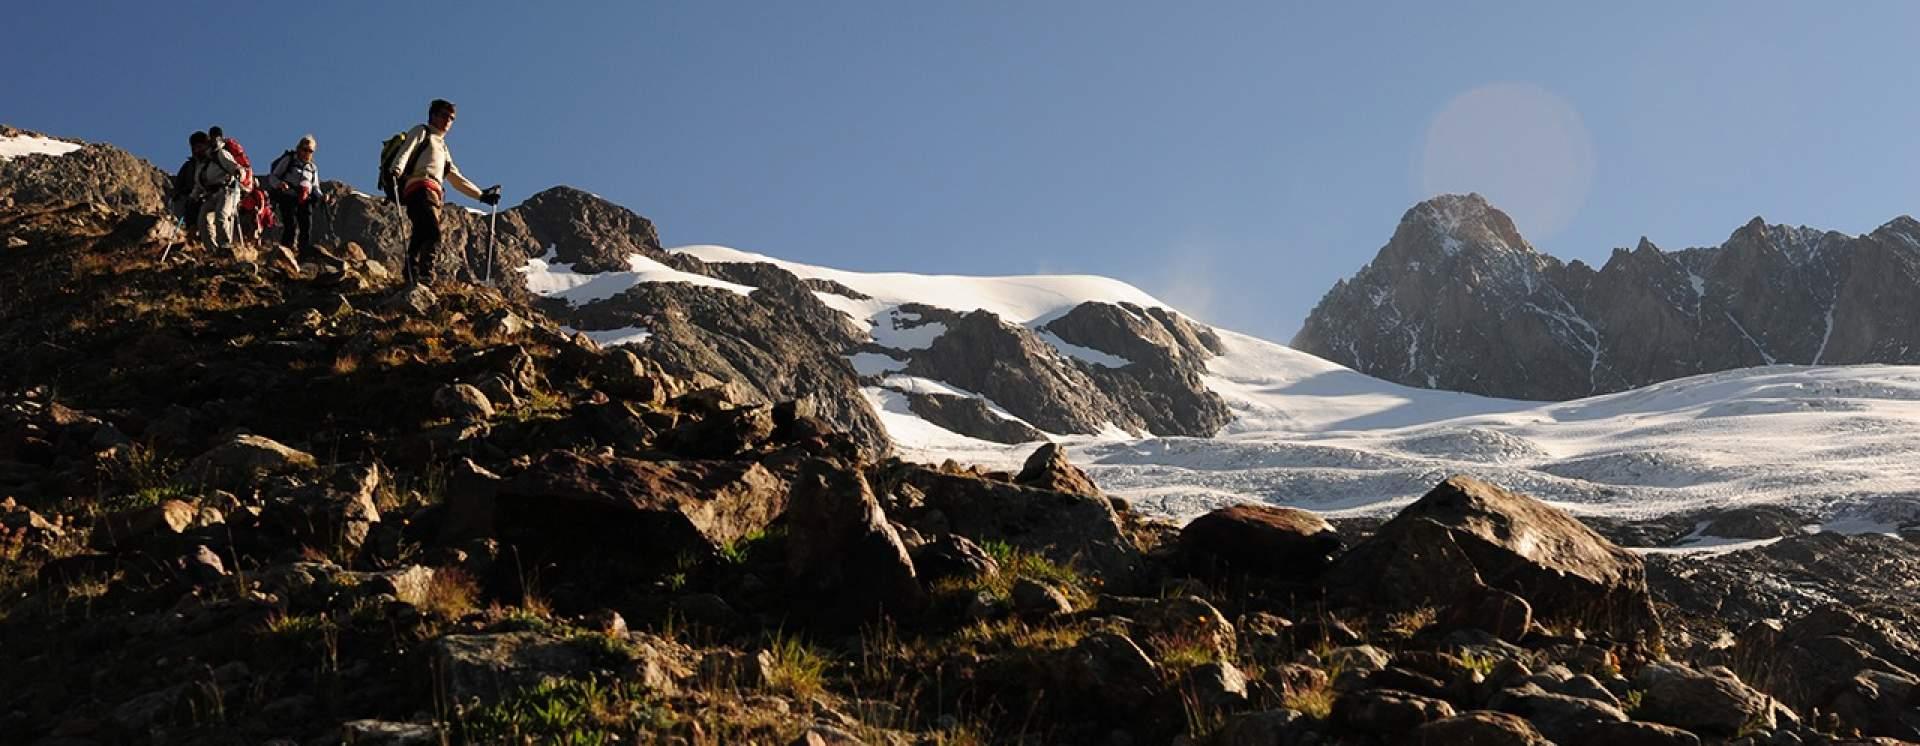 fb3316f6f Hiking - The Secret Tour du Mont-Blanc - 7 days | Chamonix Guides